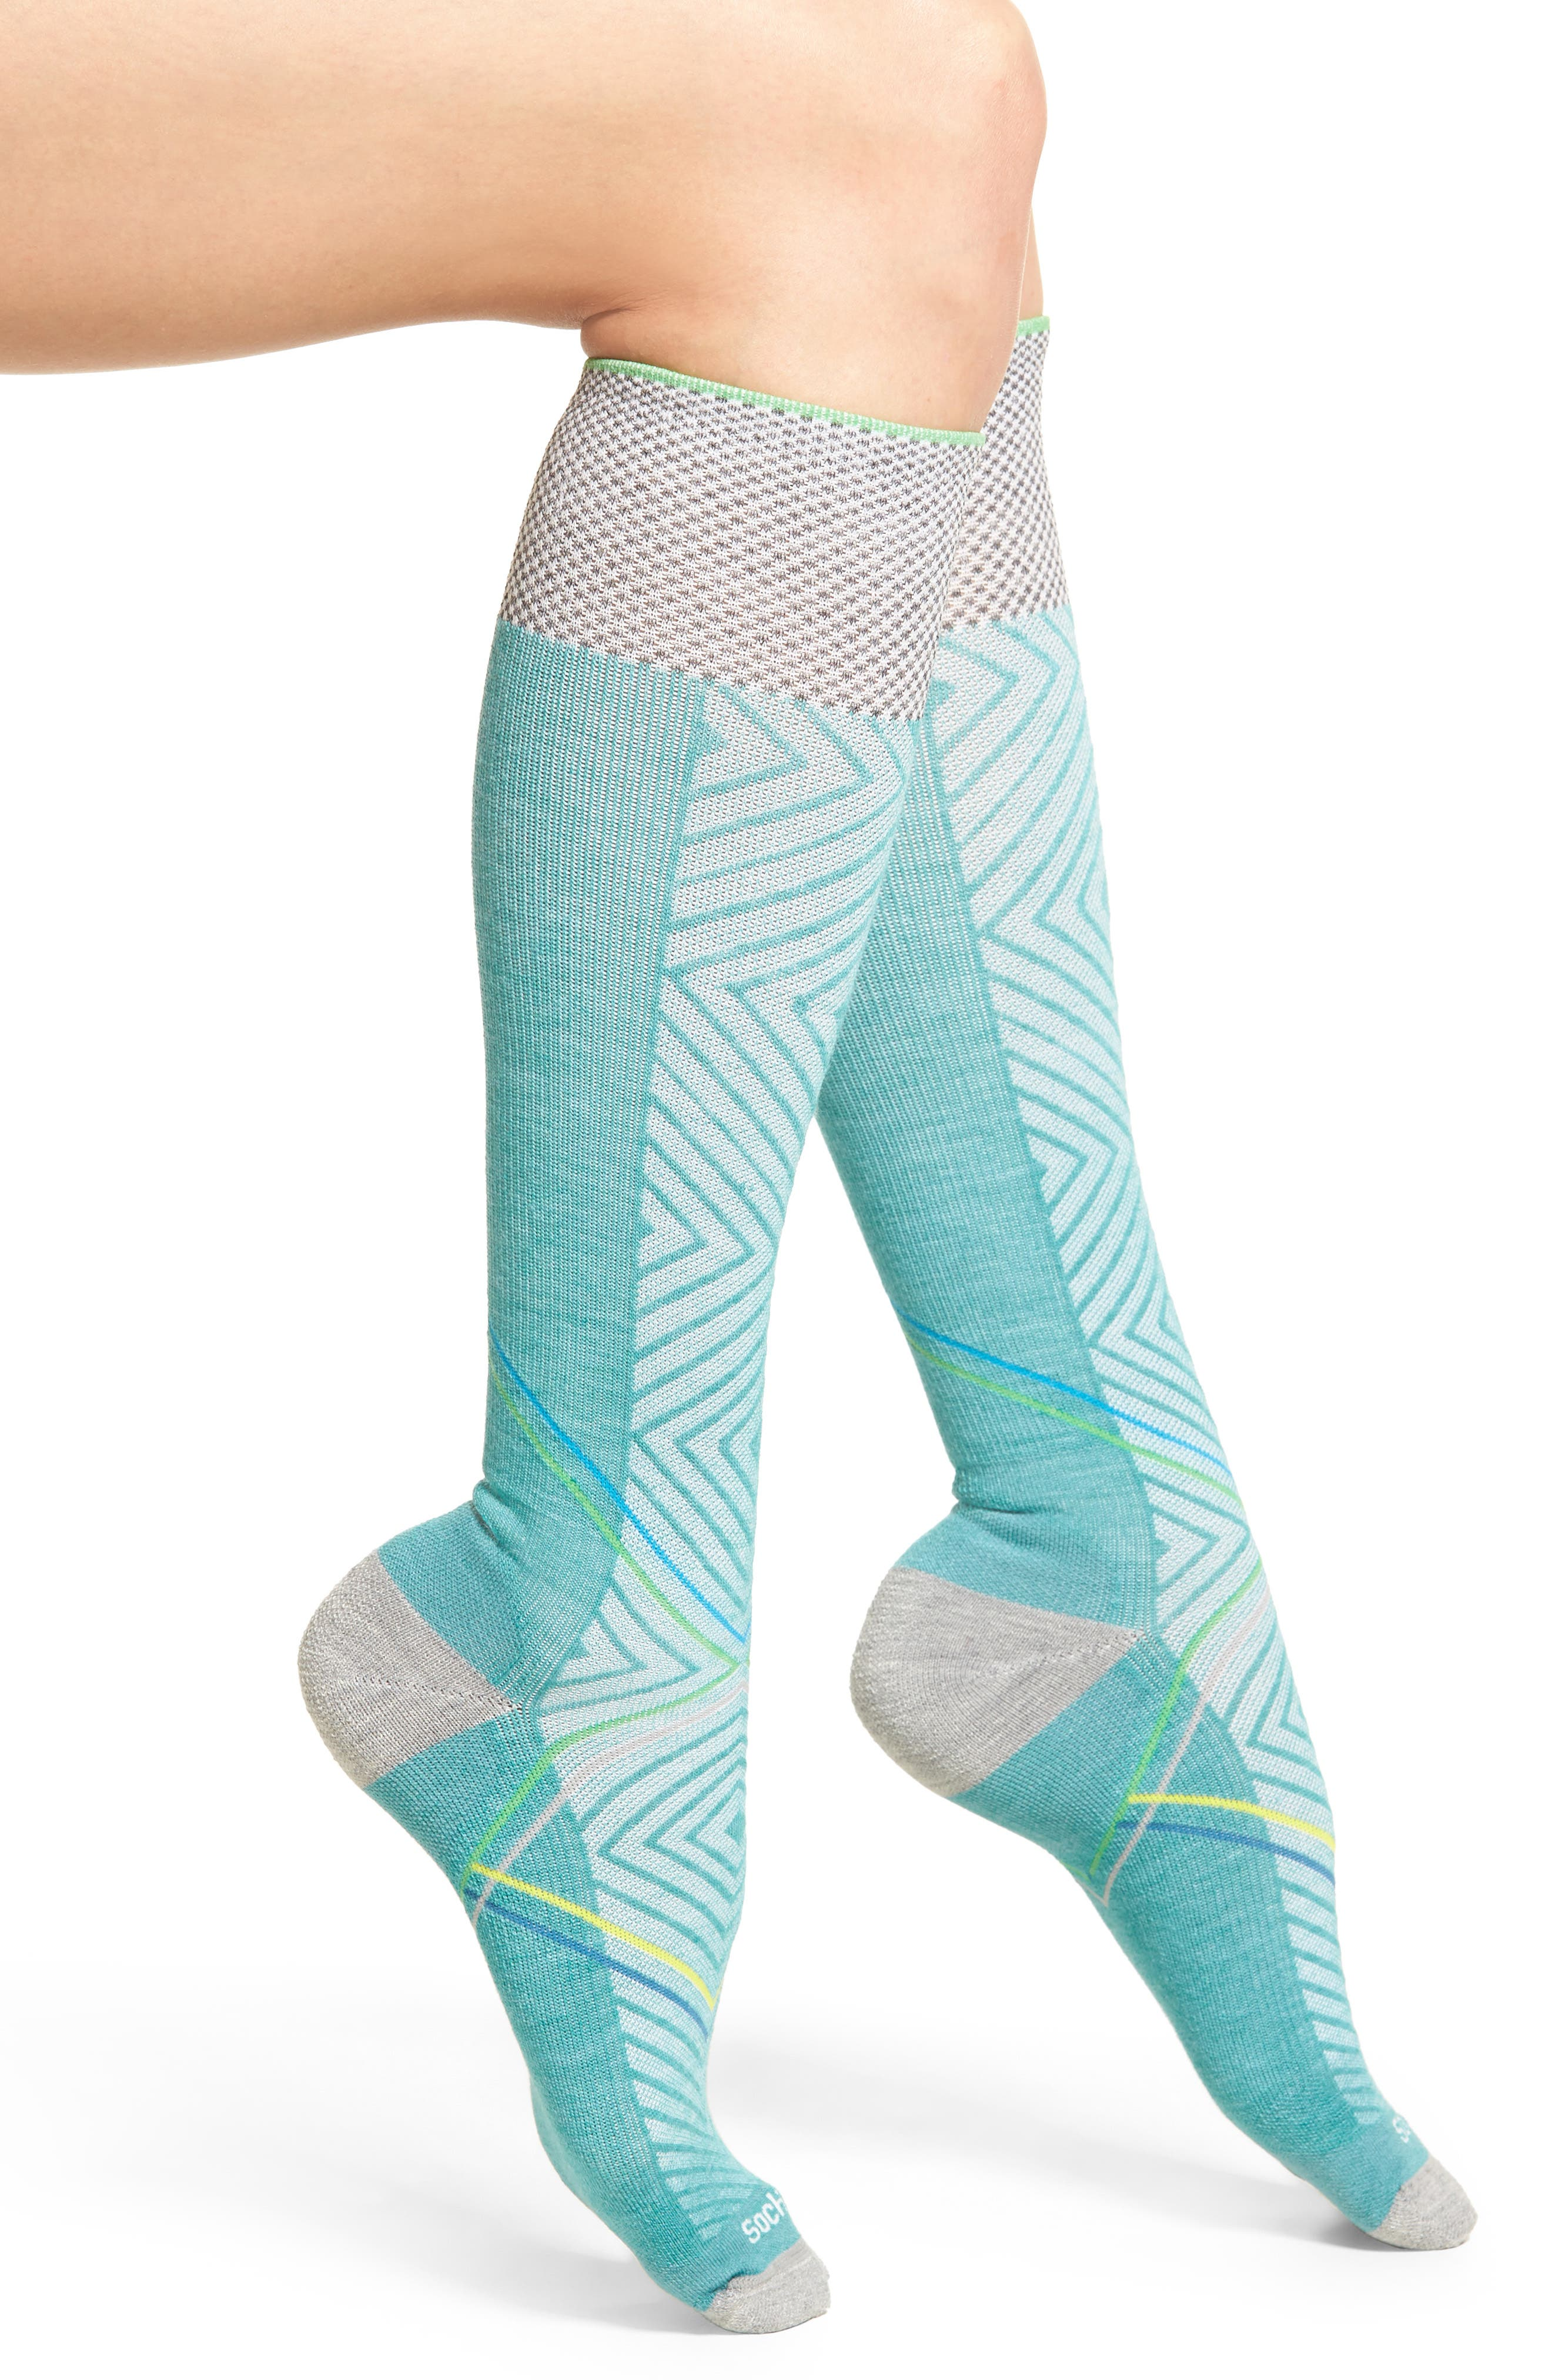 Main Image - Sockwell Pulse Compression Knee Socks